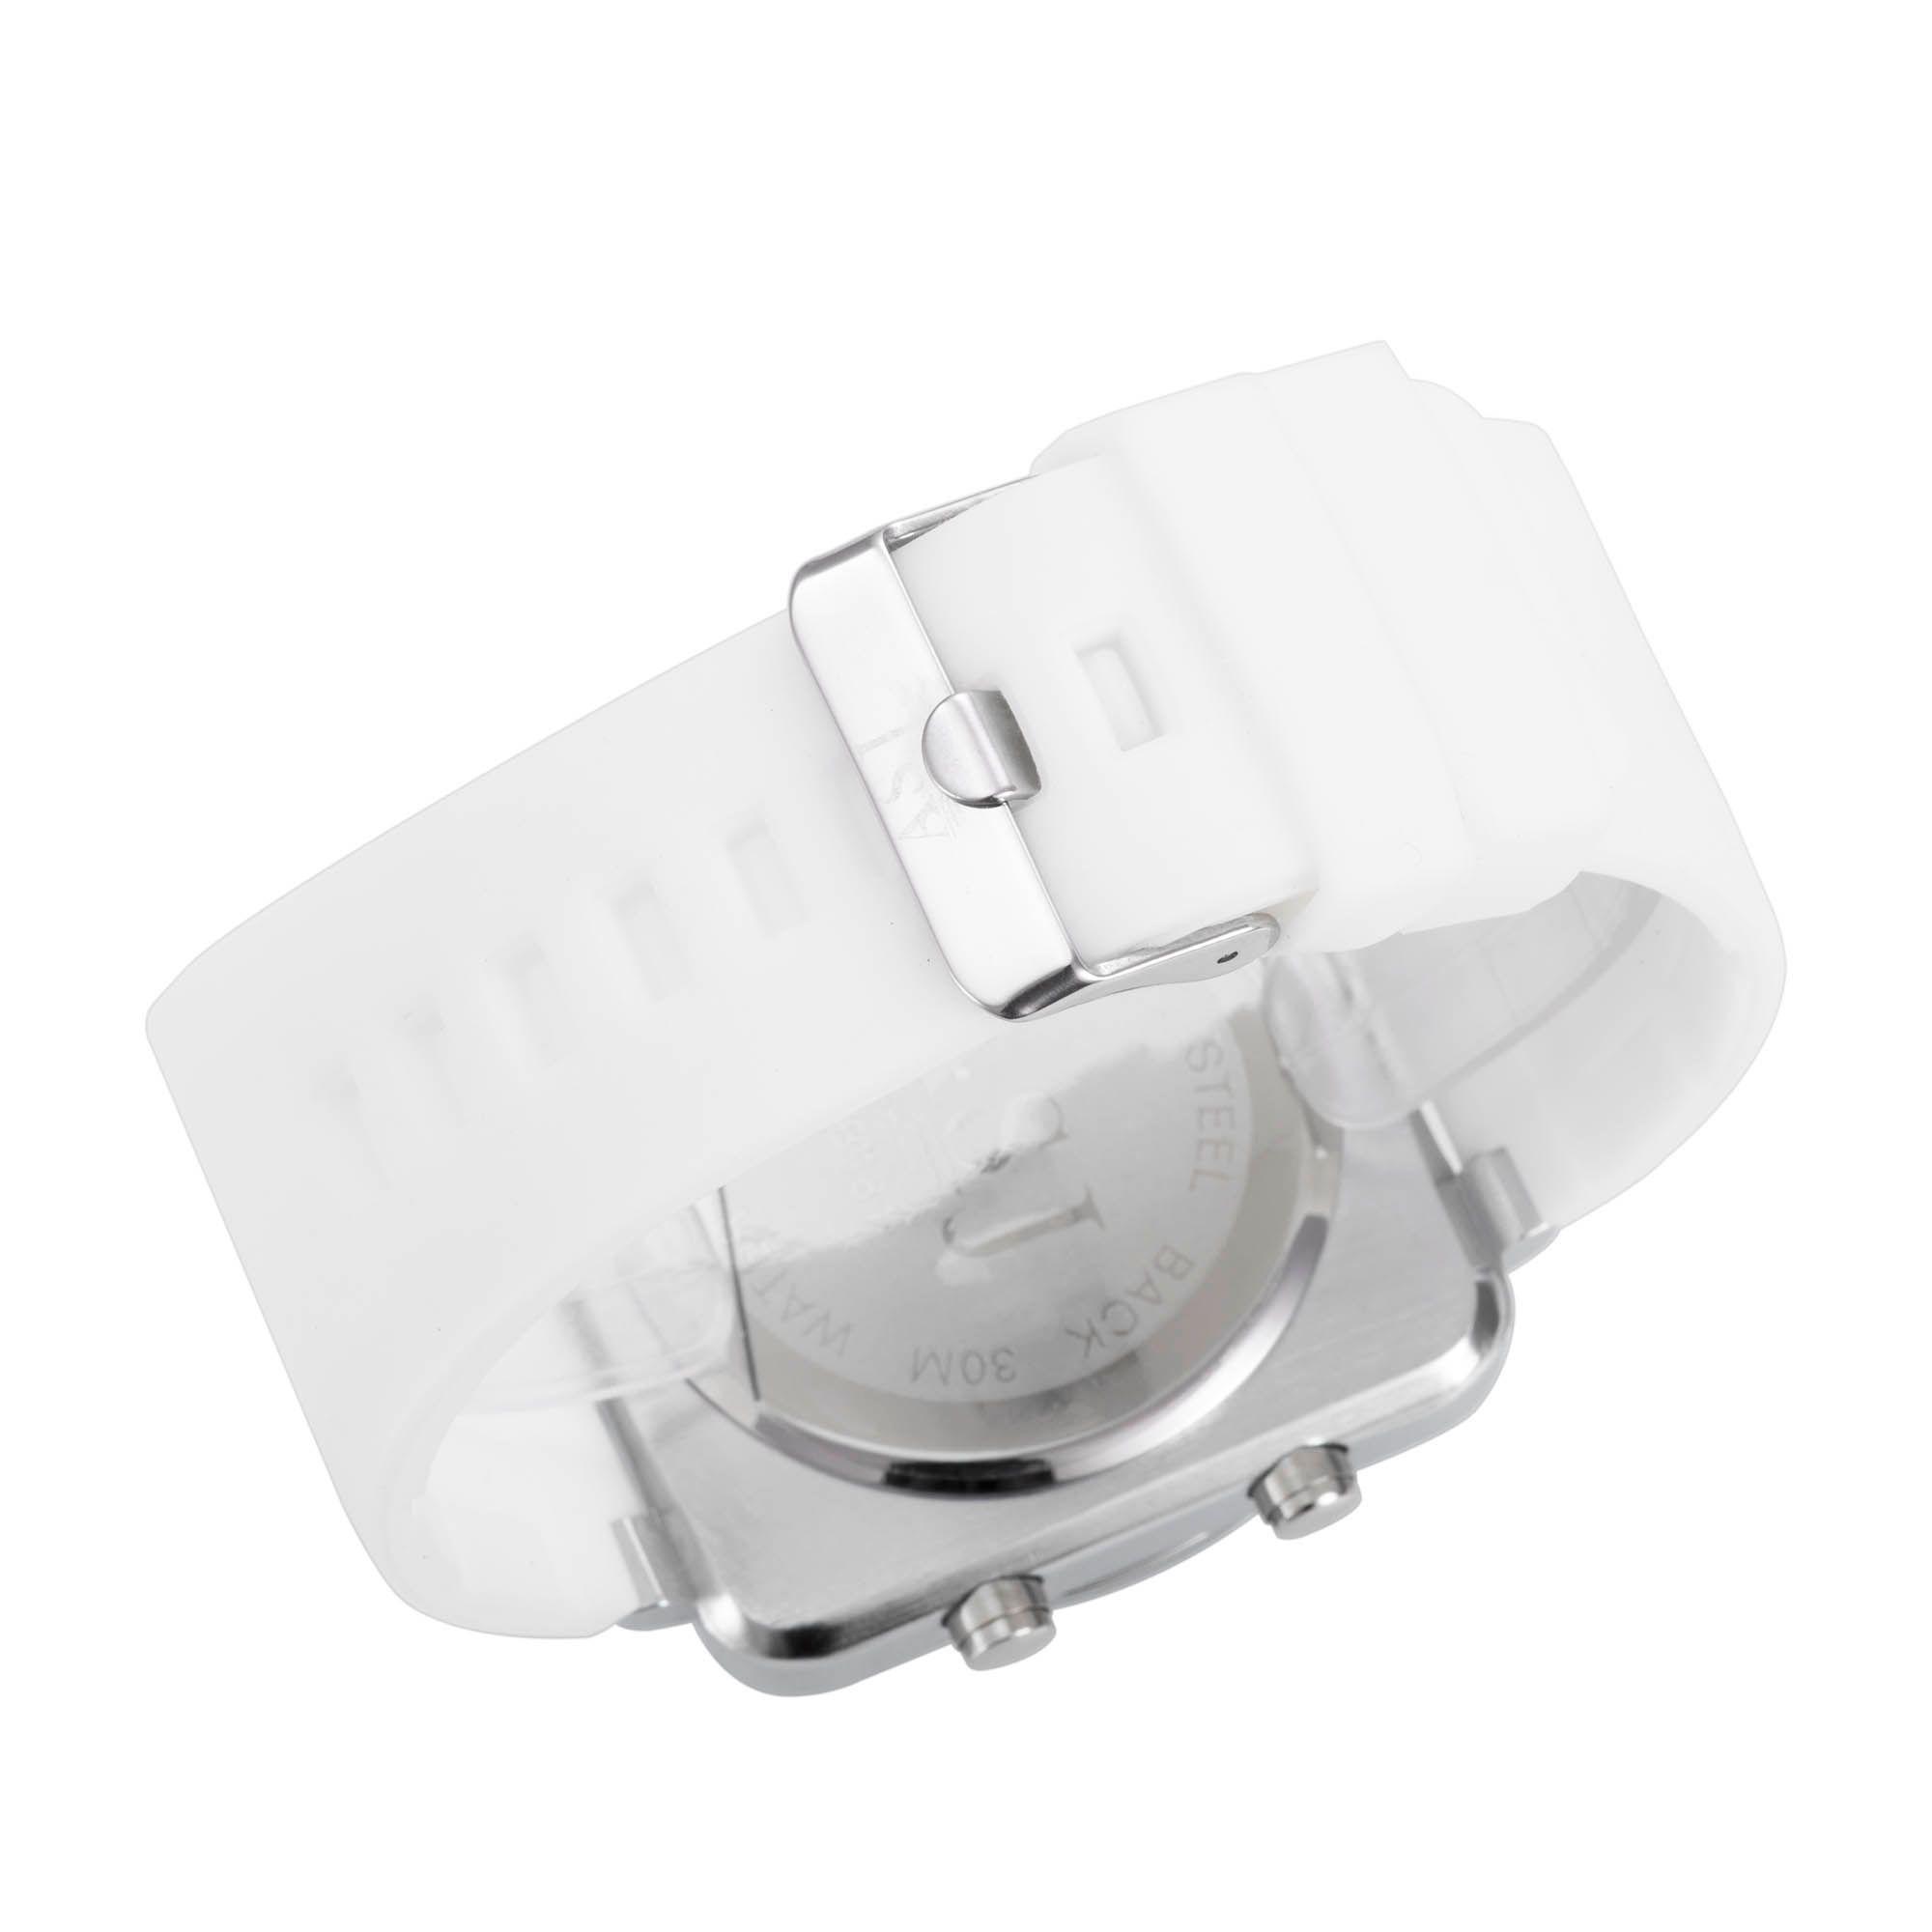 ASJ b008 Dual Movt Three Year Battery Men Quartz + Digital Watch